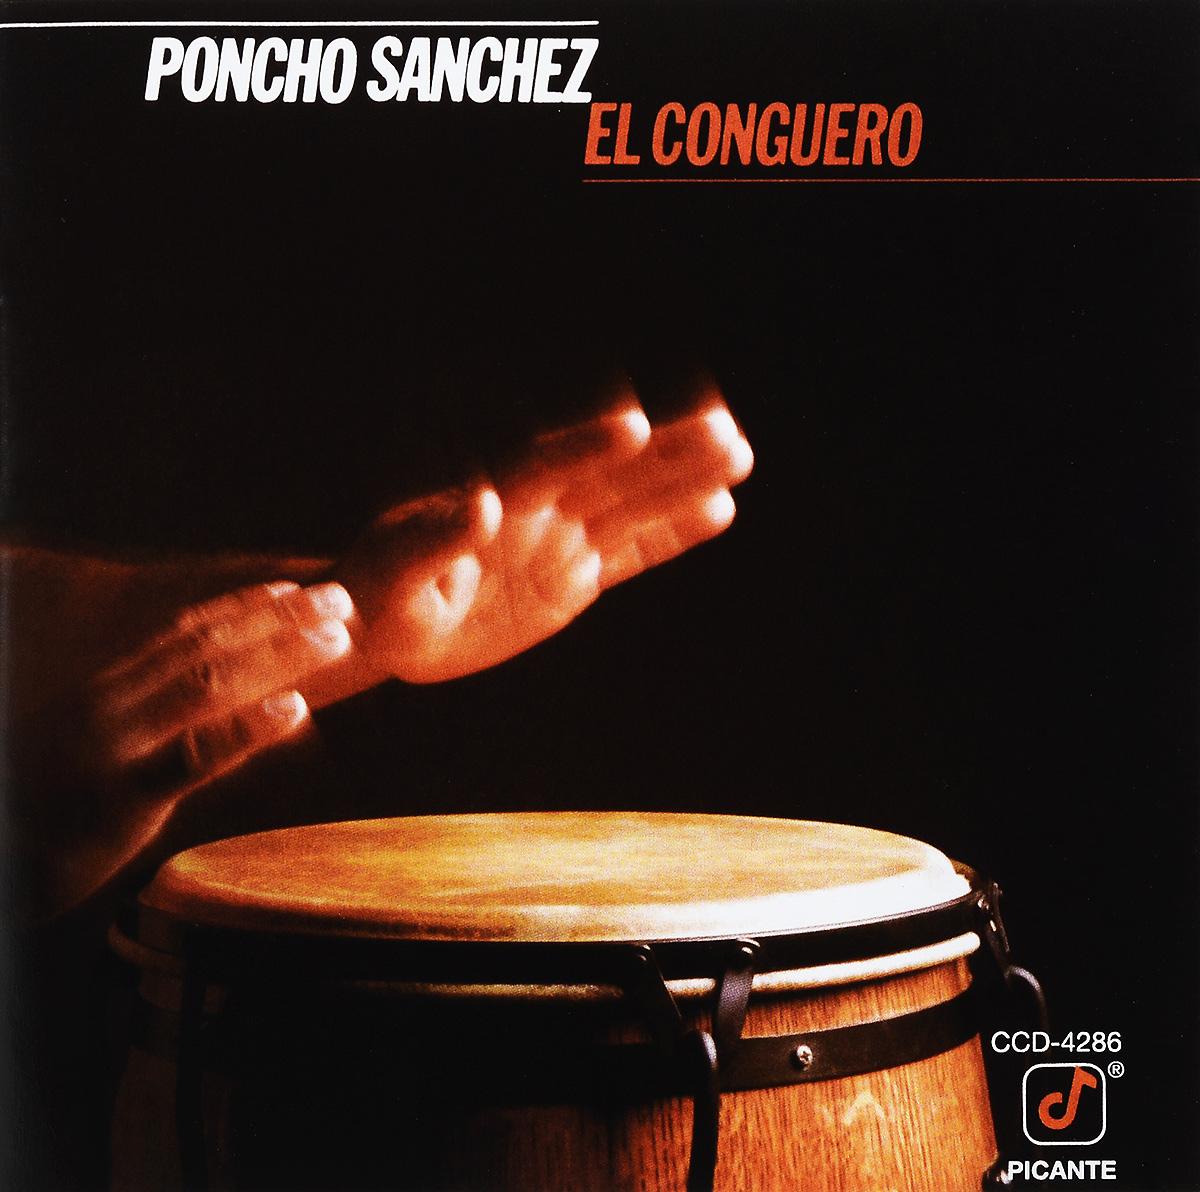 Пончо Санчез Poncho Sanchez. El Conguero пончо женский mystic poncho mint